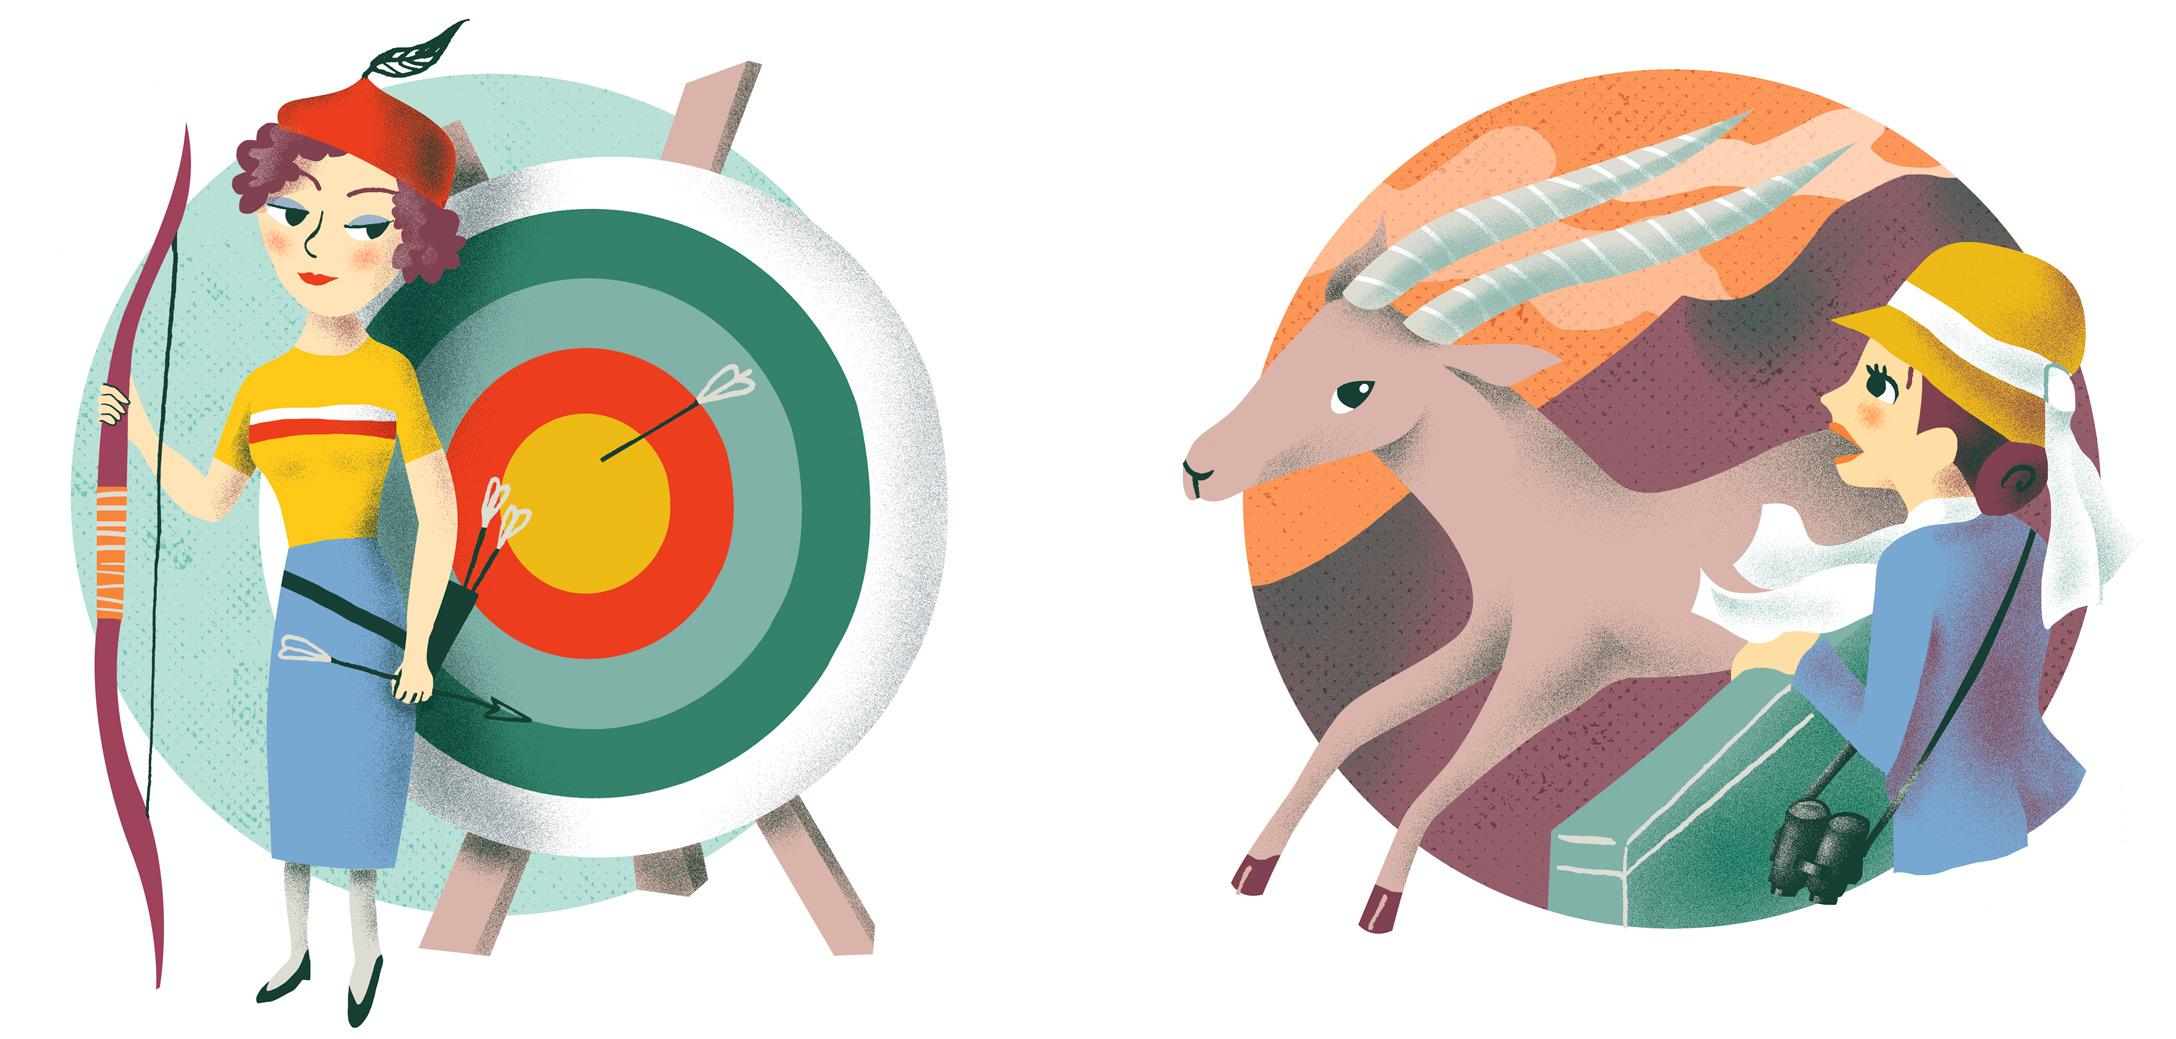 Annalisa Papagna illustration - Horoscope: Sagittarius and Capricorn